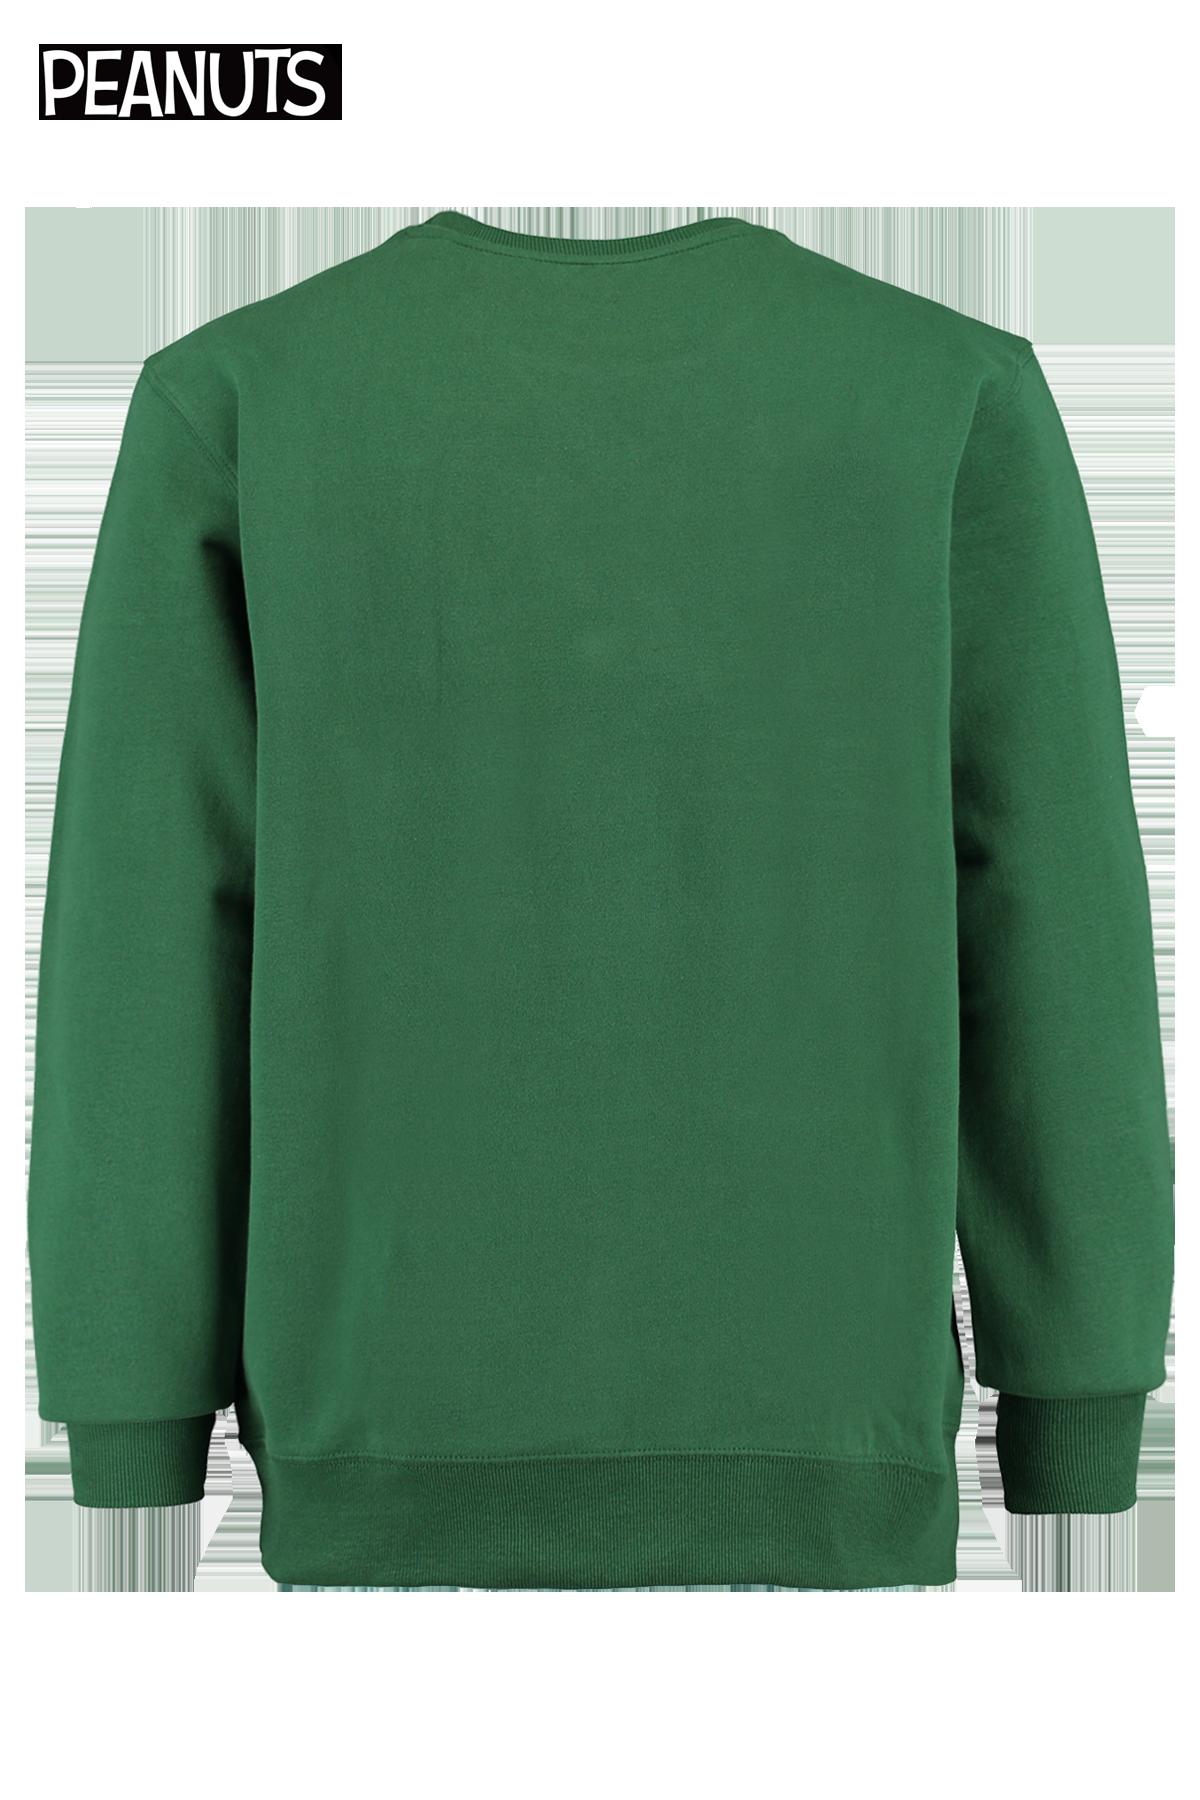 Sweater Sterling shoof